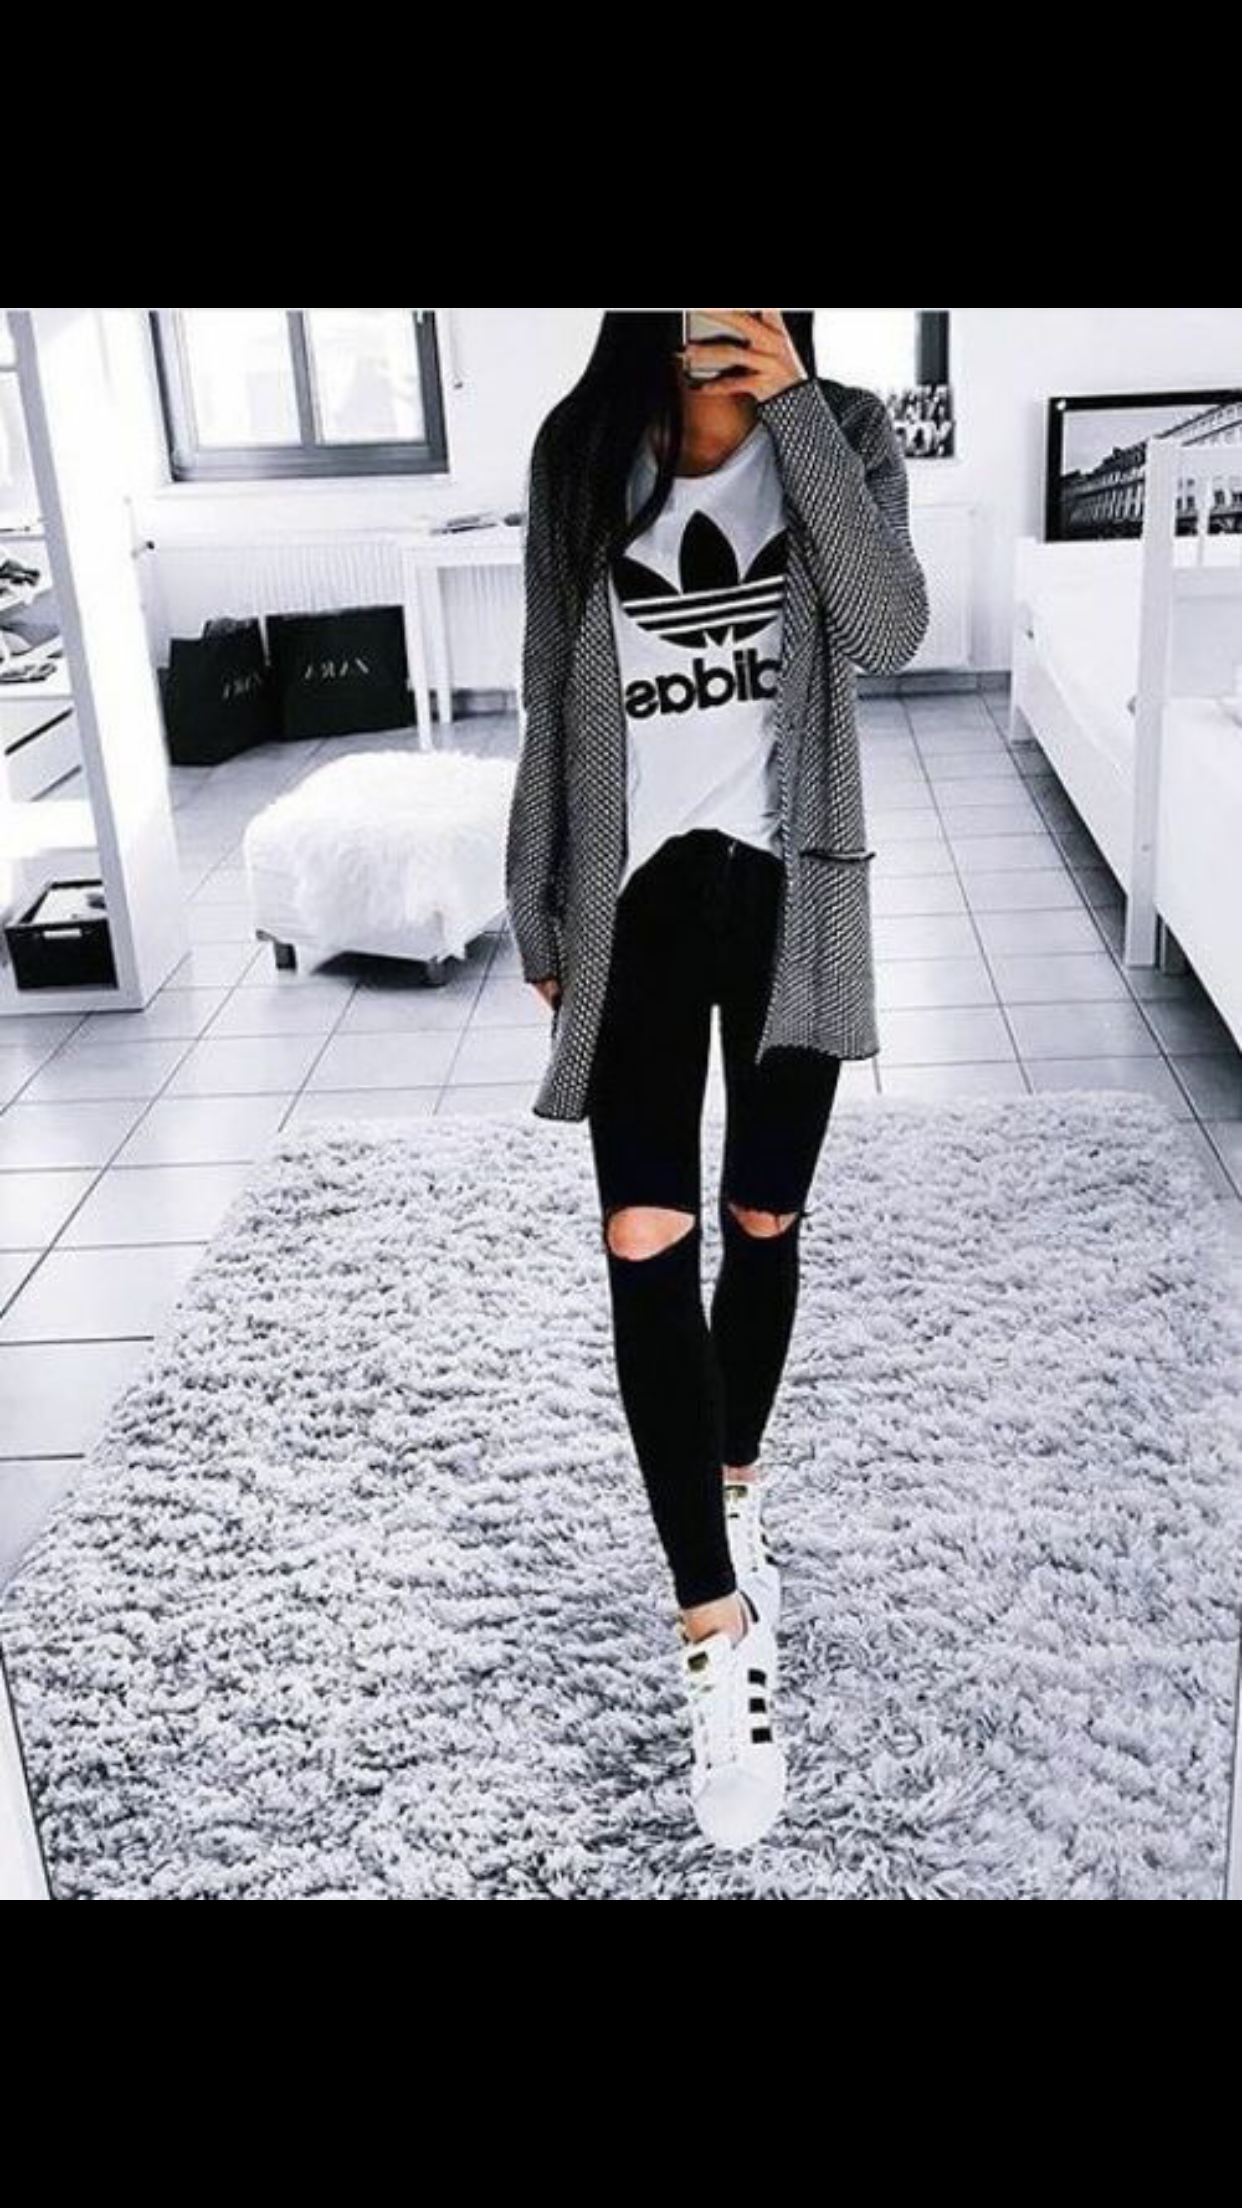 منو يحب ماركة اديداس اني وحدة منهم افضل ماركة Fashion Adidas Outfit Cool Outfits